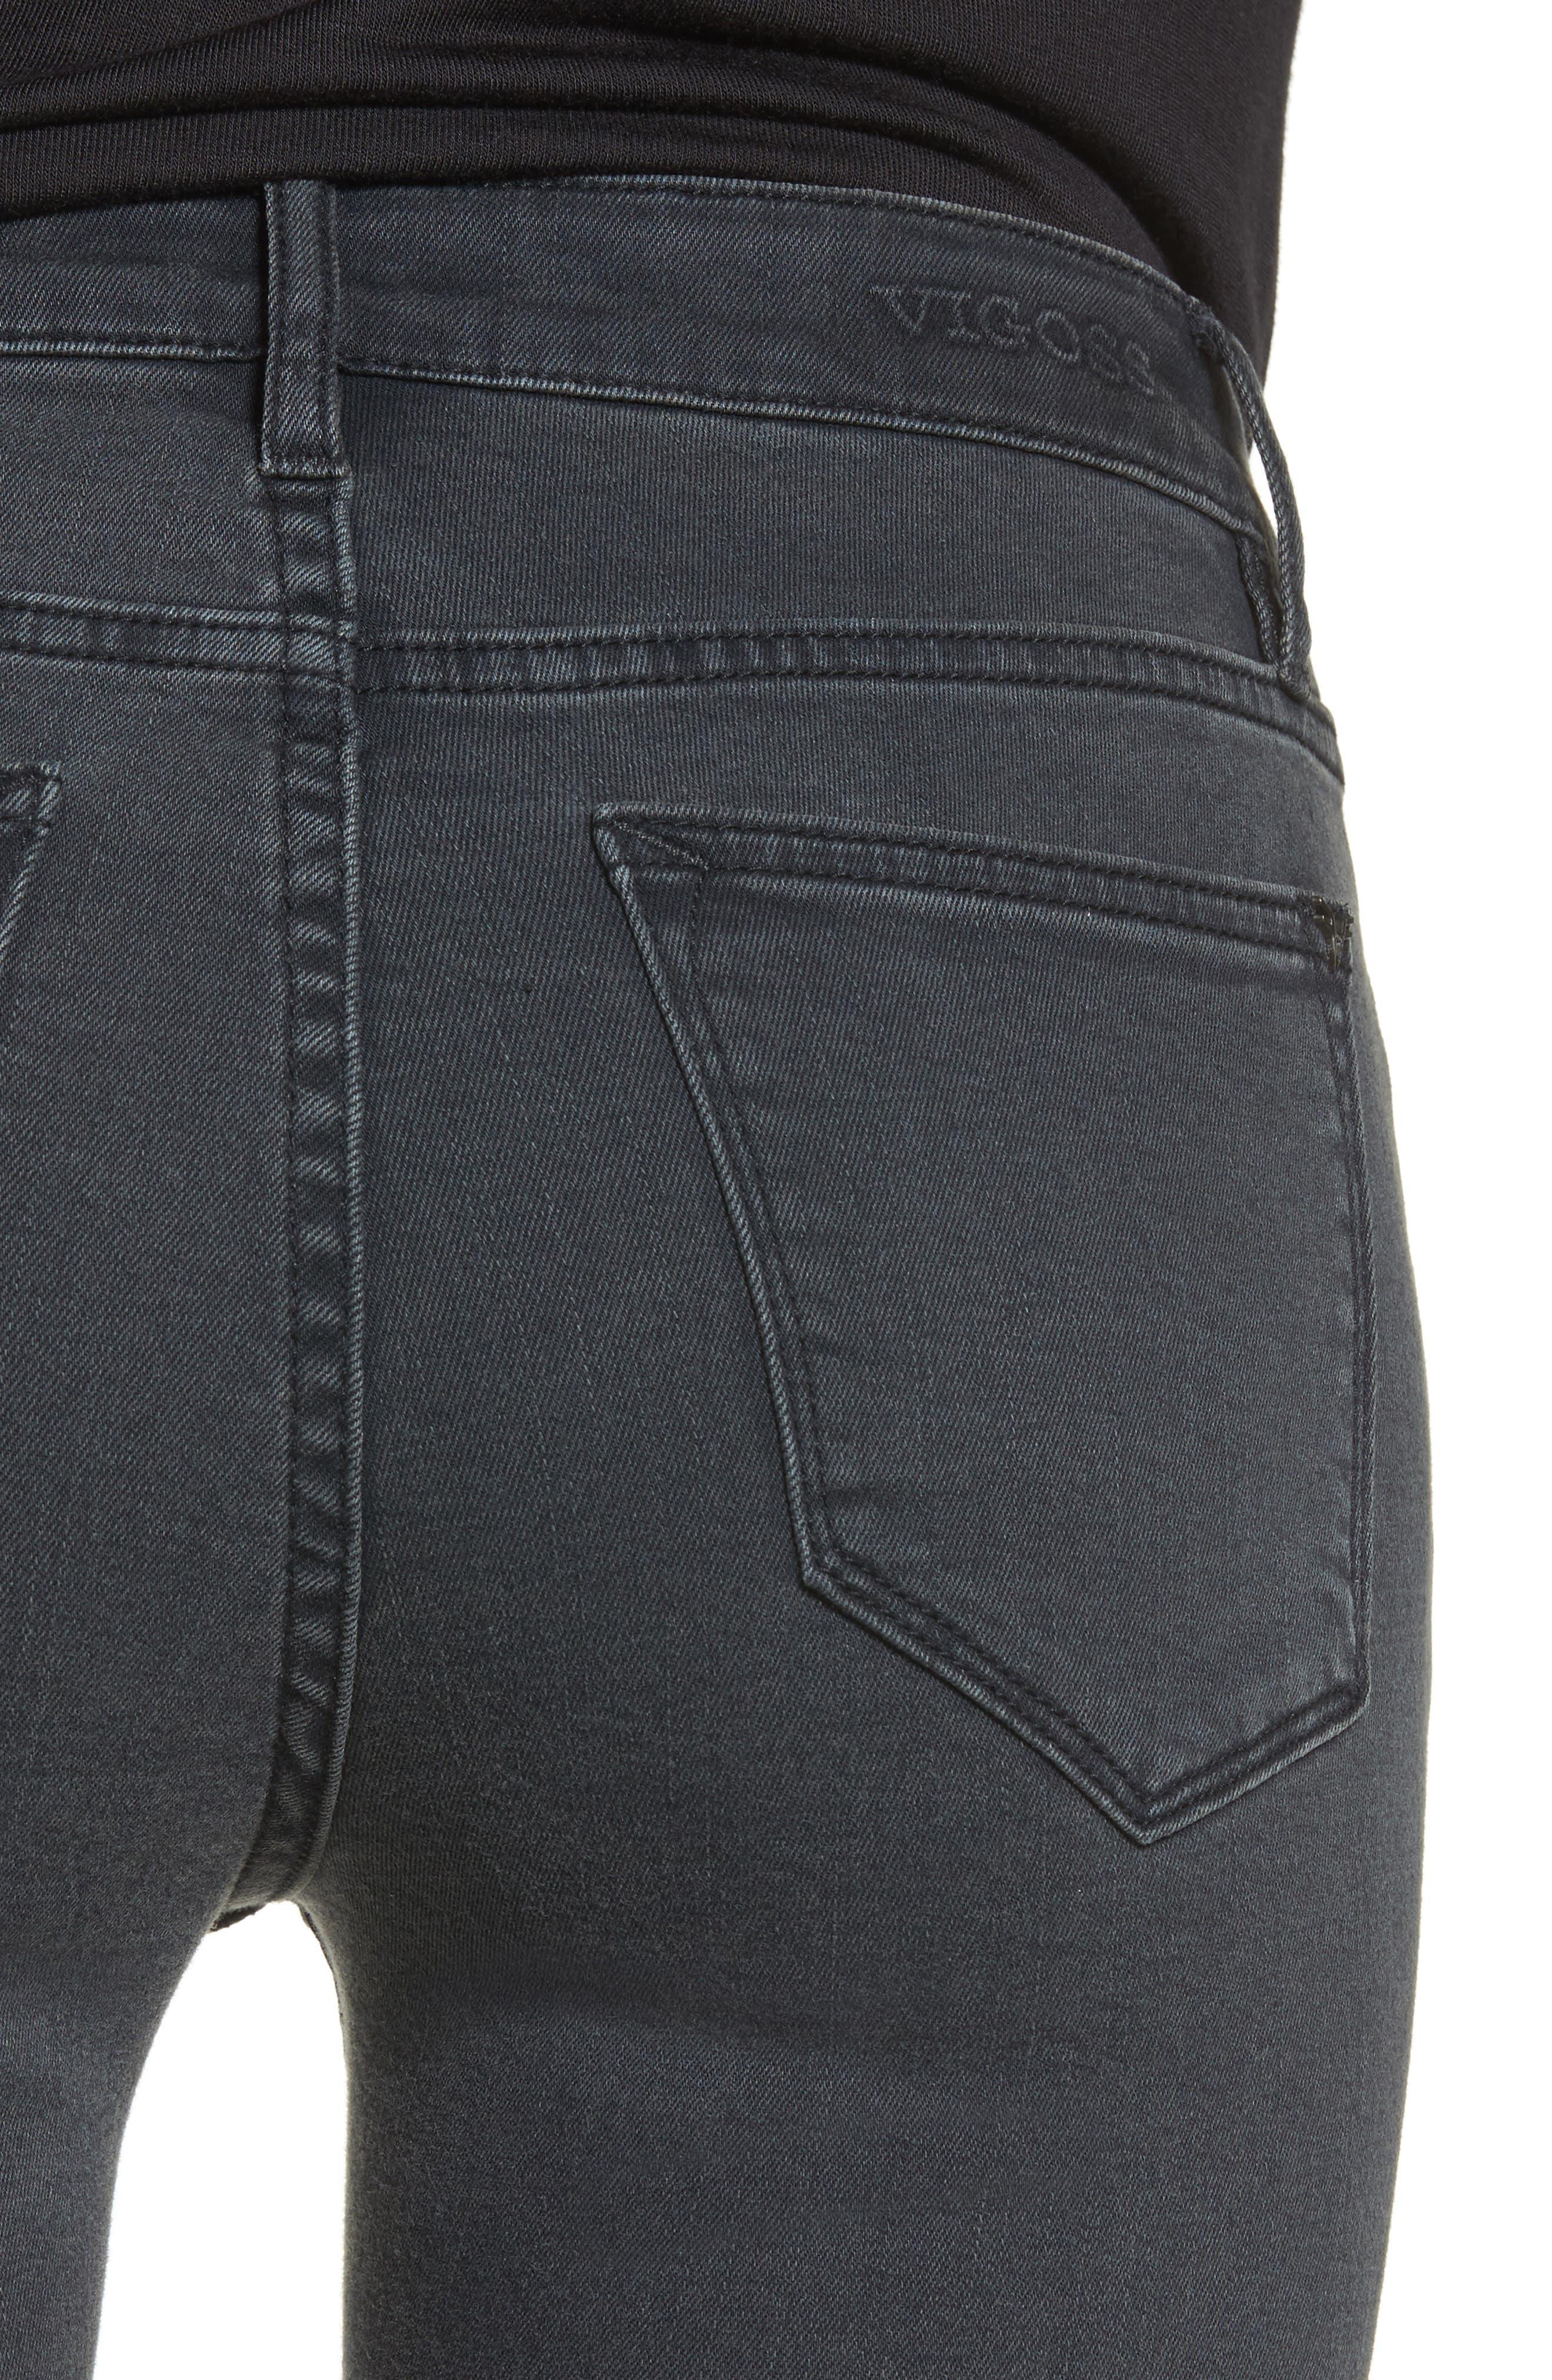 Alternate Image 4  - Vigoss Jagger Front Seam Skinny Jeans